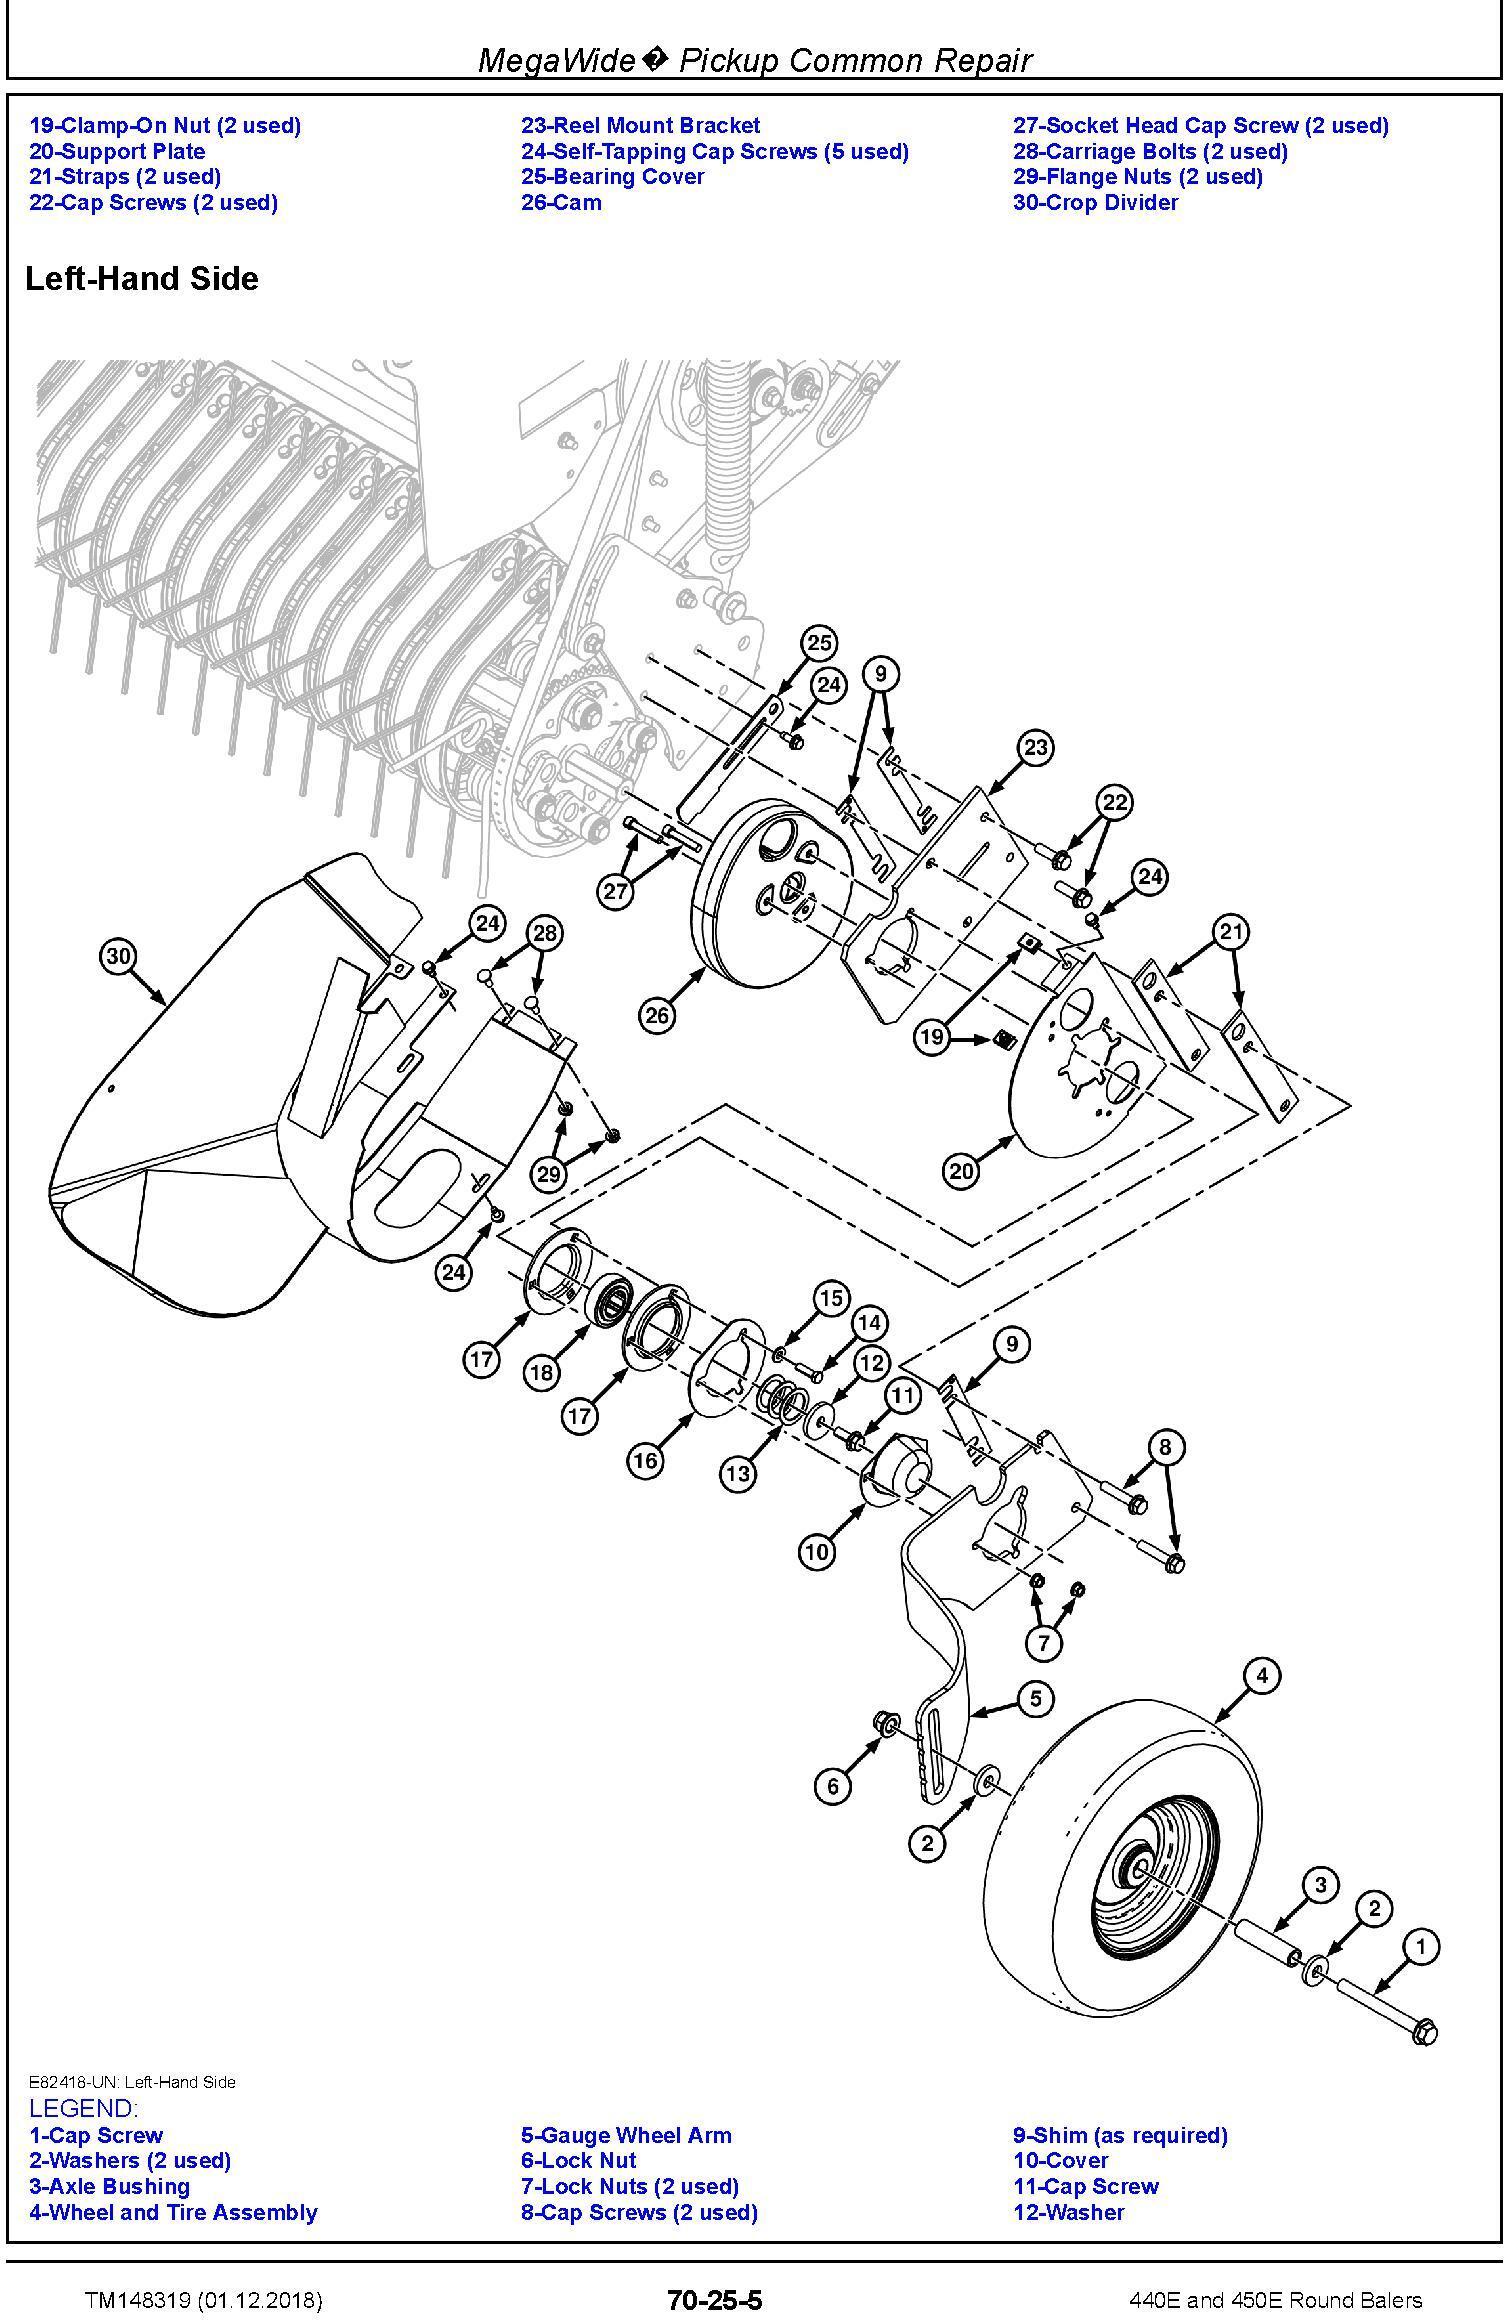 John Deere 440E and 450E Round Balers Technical Service Manual (TM148319) - 2